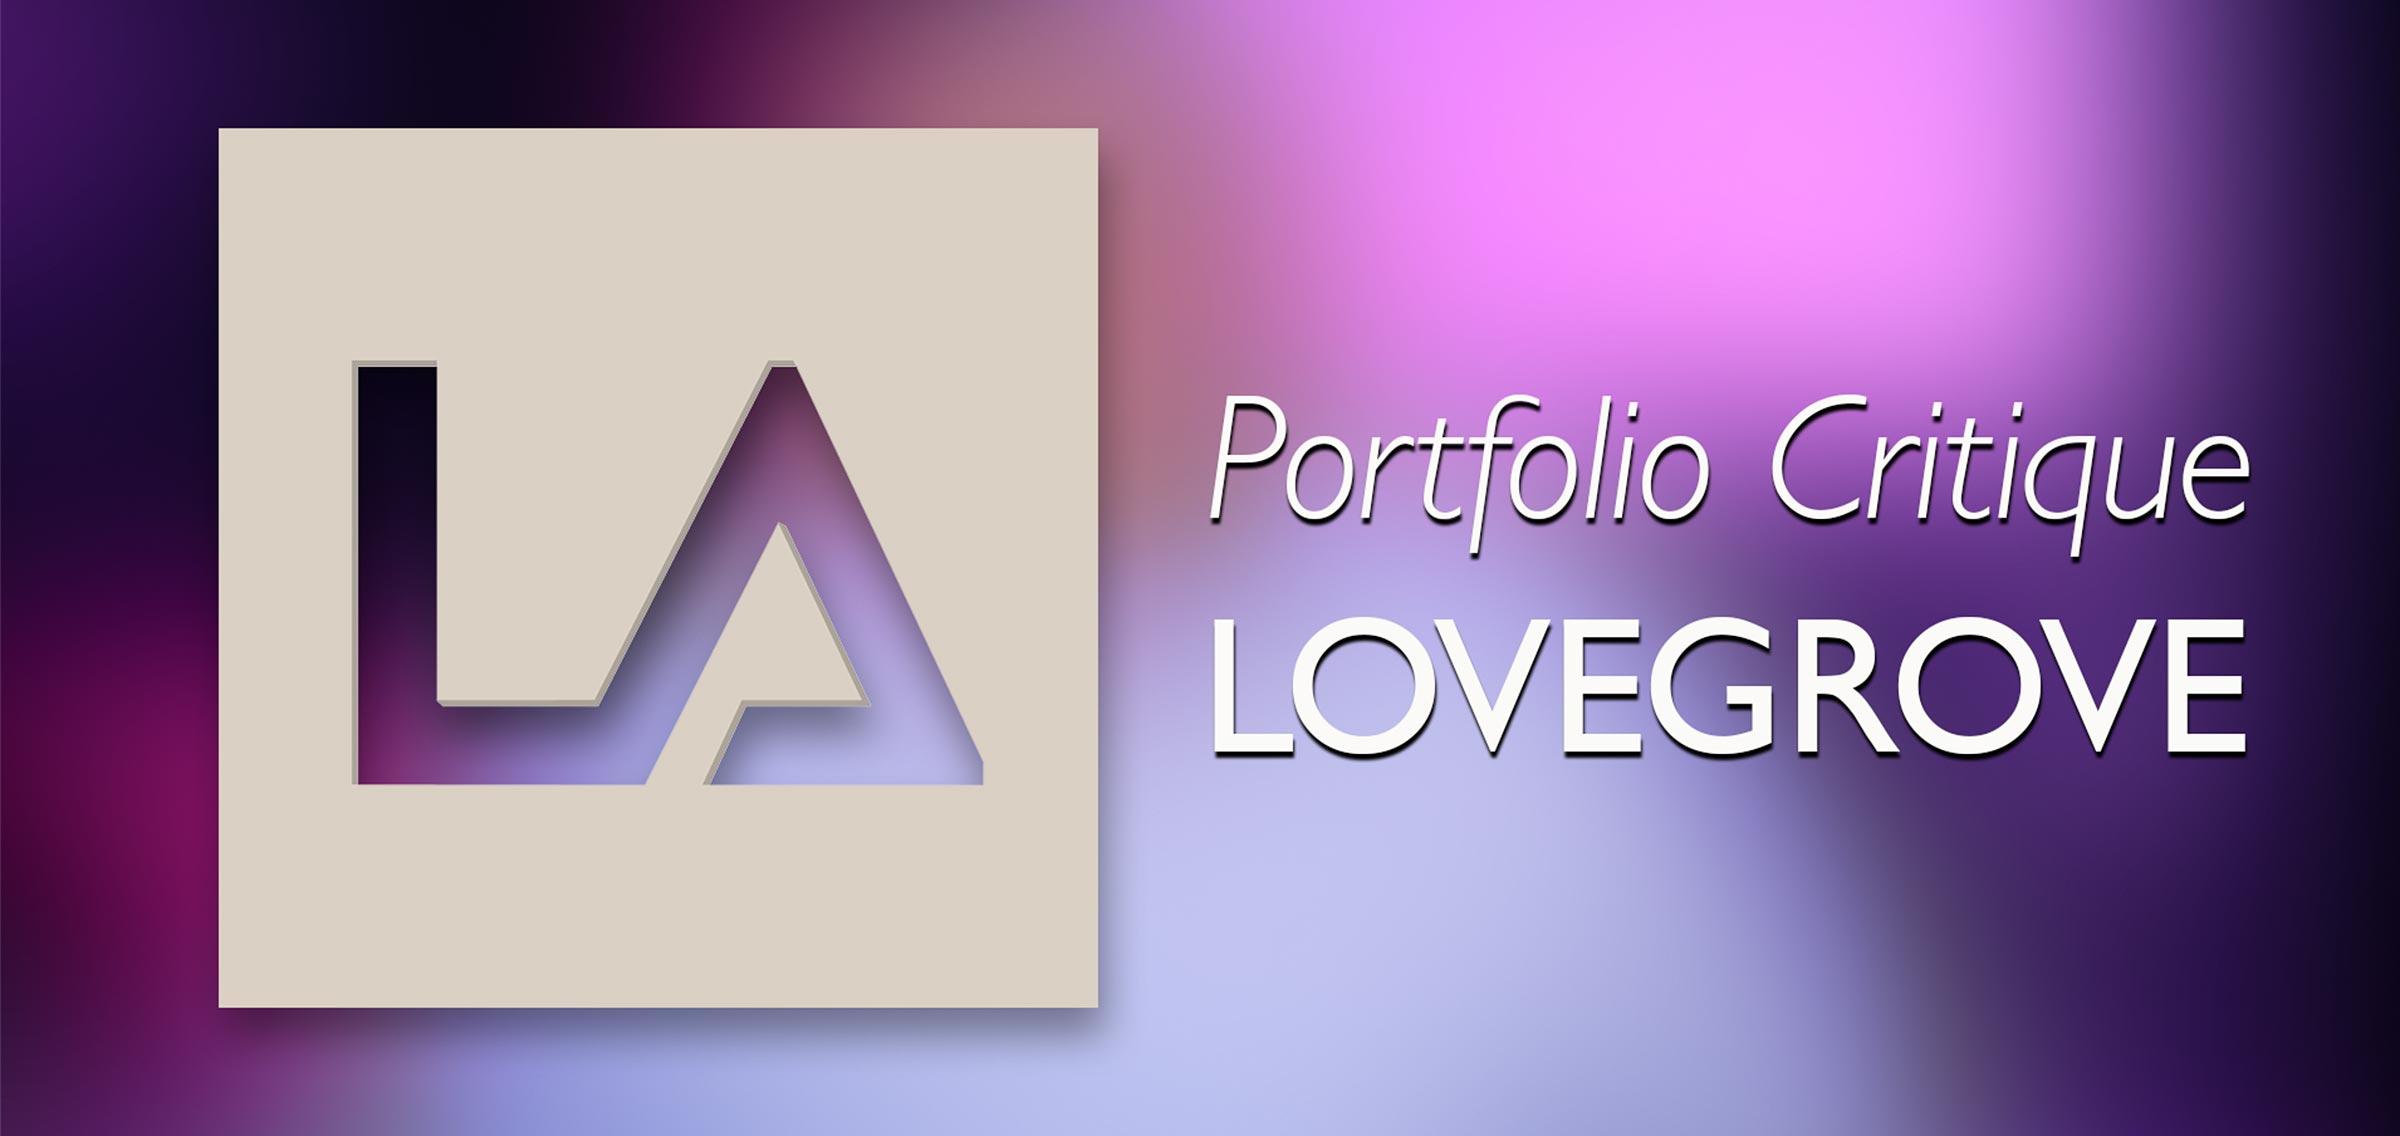 Portfolio critiques by Damien Lovegrove